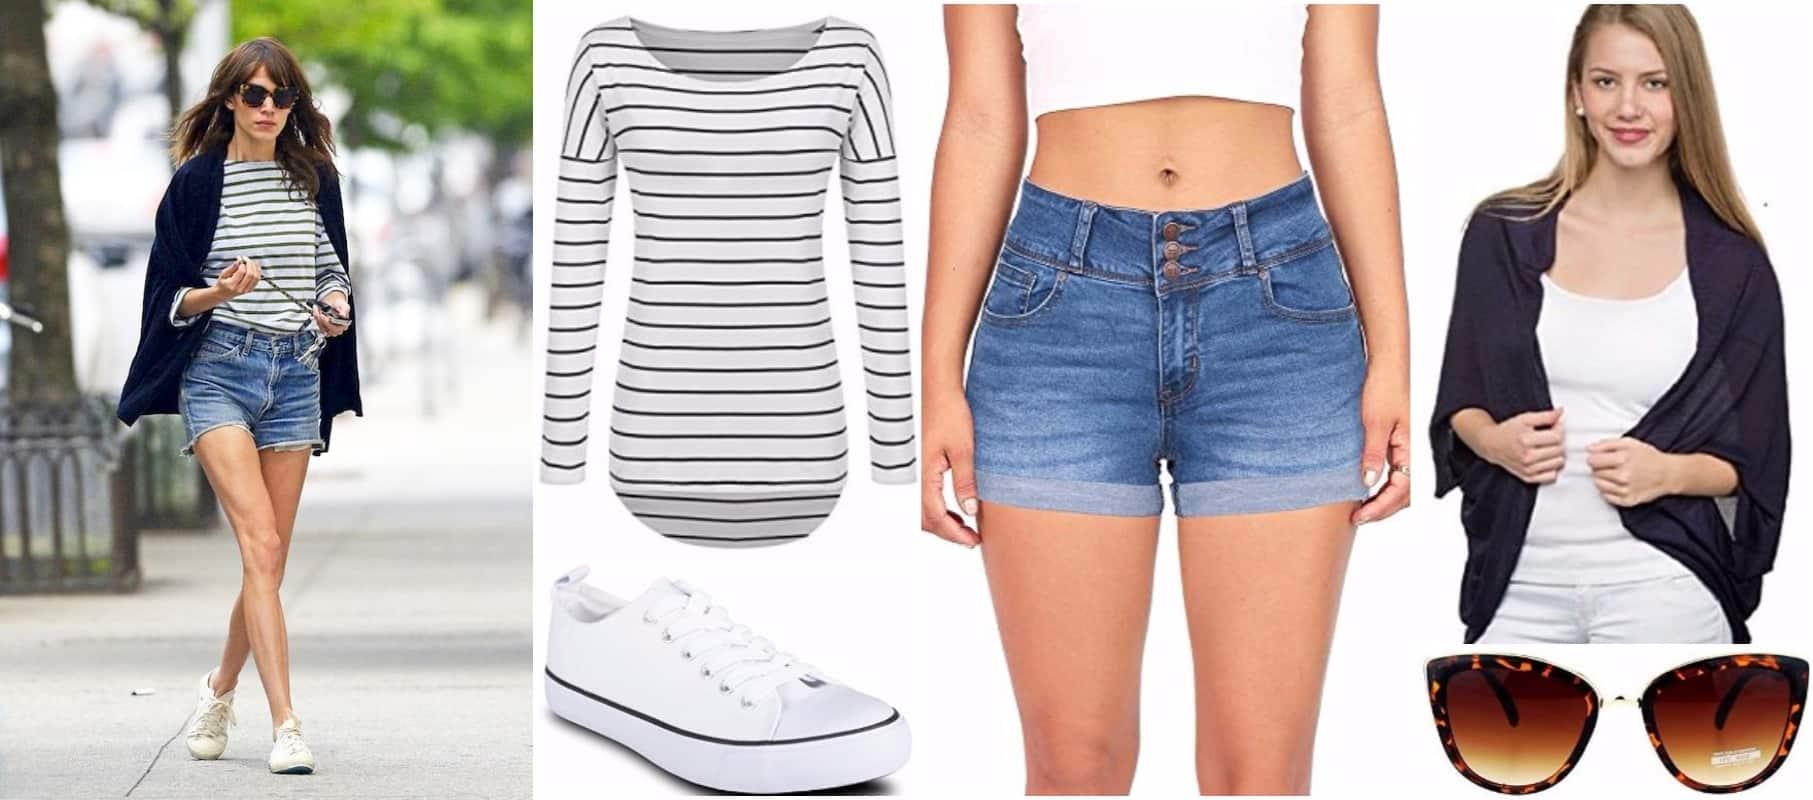 womens-denim-shorts-combination.jpg